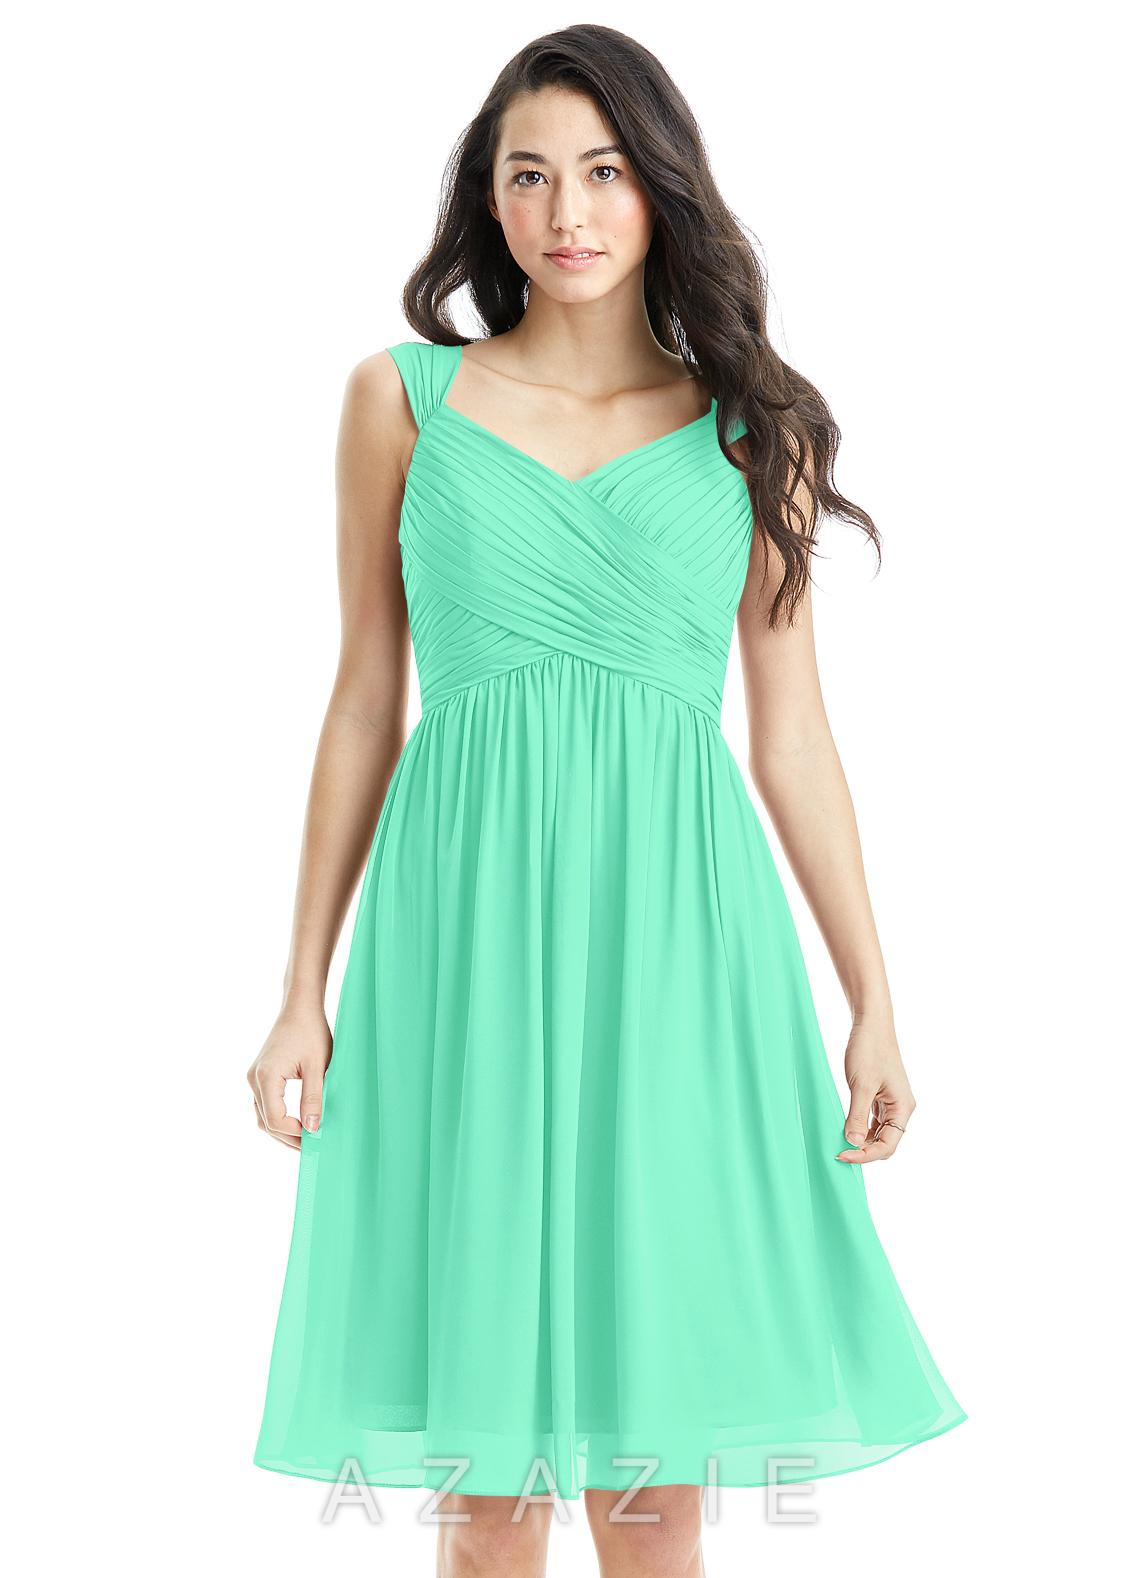 Turquoise bridesmaid dresses turquoise gowns azazie azazie angie azazie angie ombrellifo Choice Image